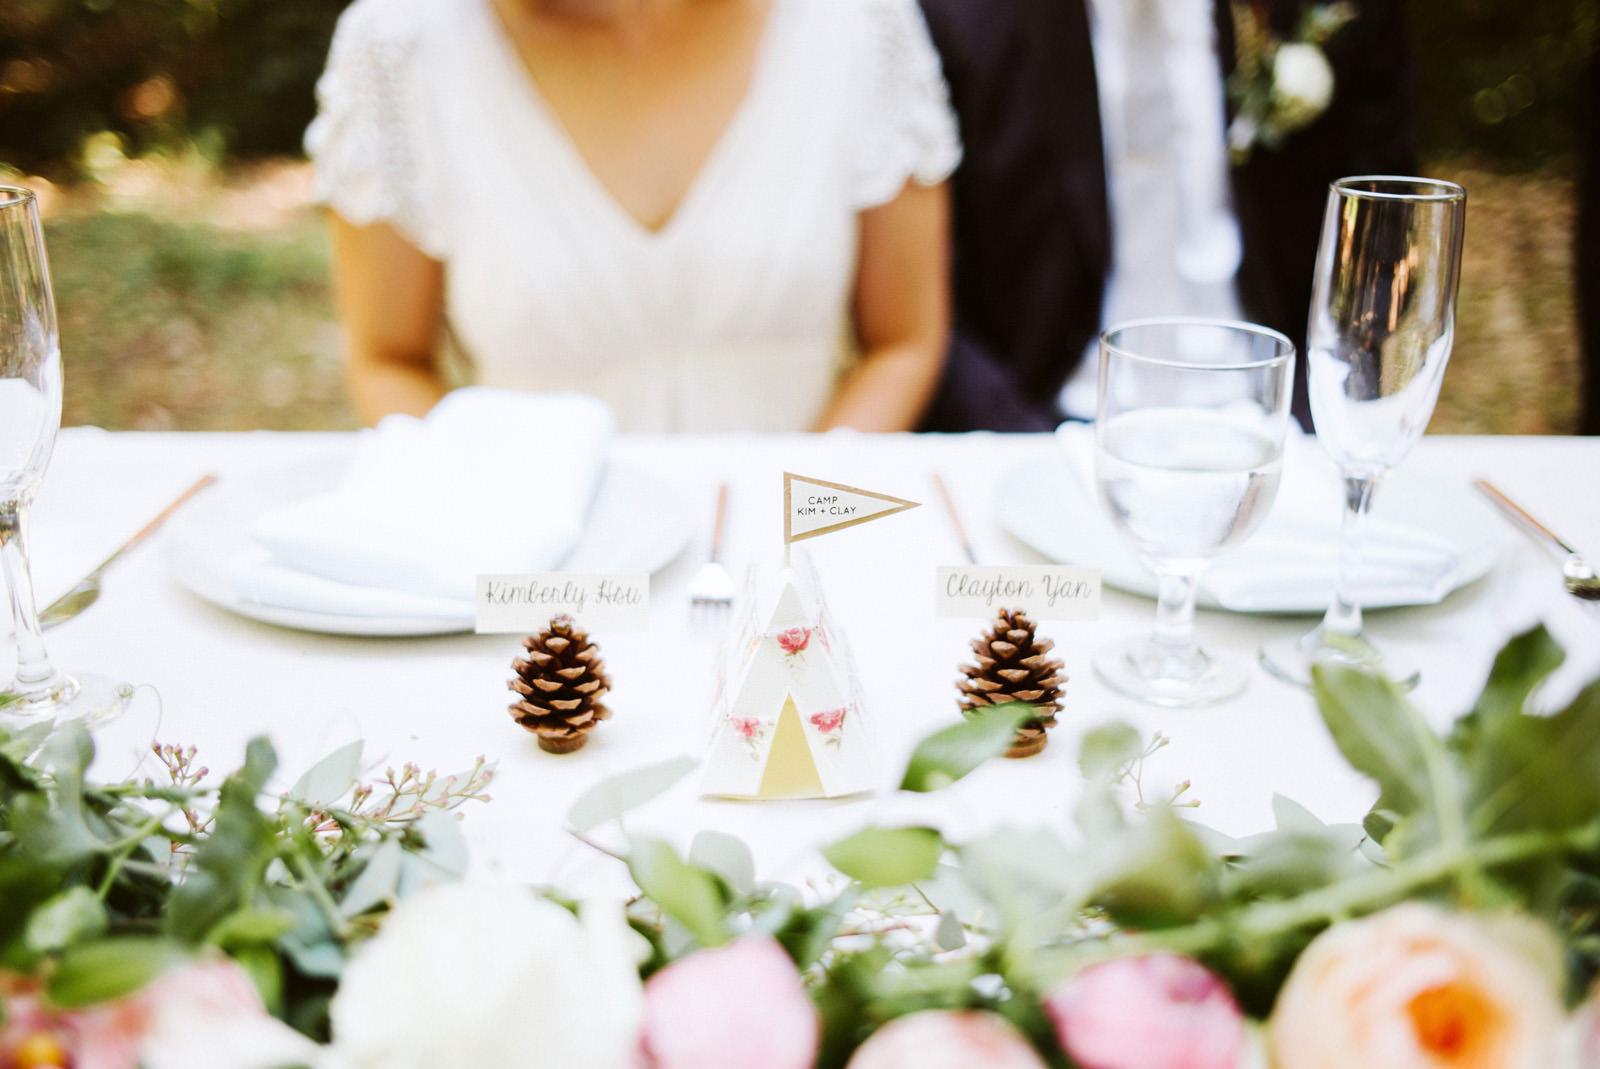 kimclay-blog-063 REDWOOD FOREST WEDDING